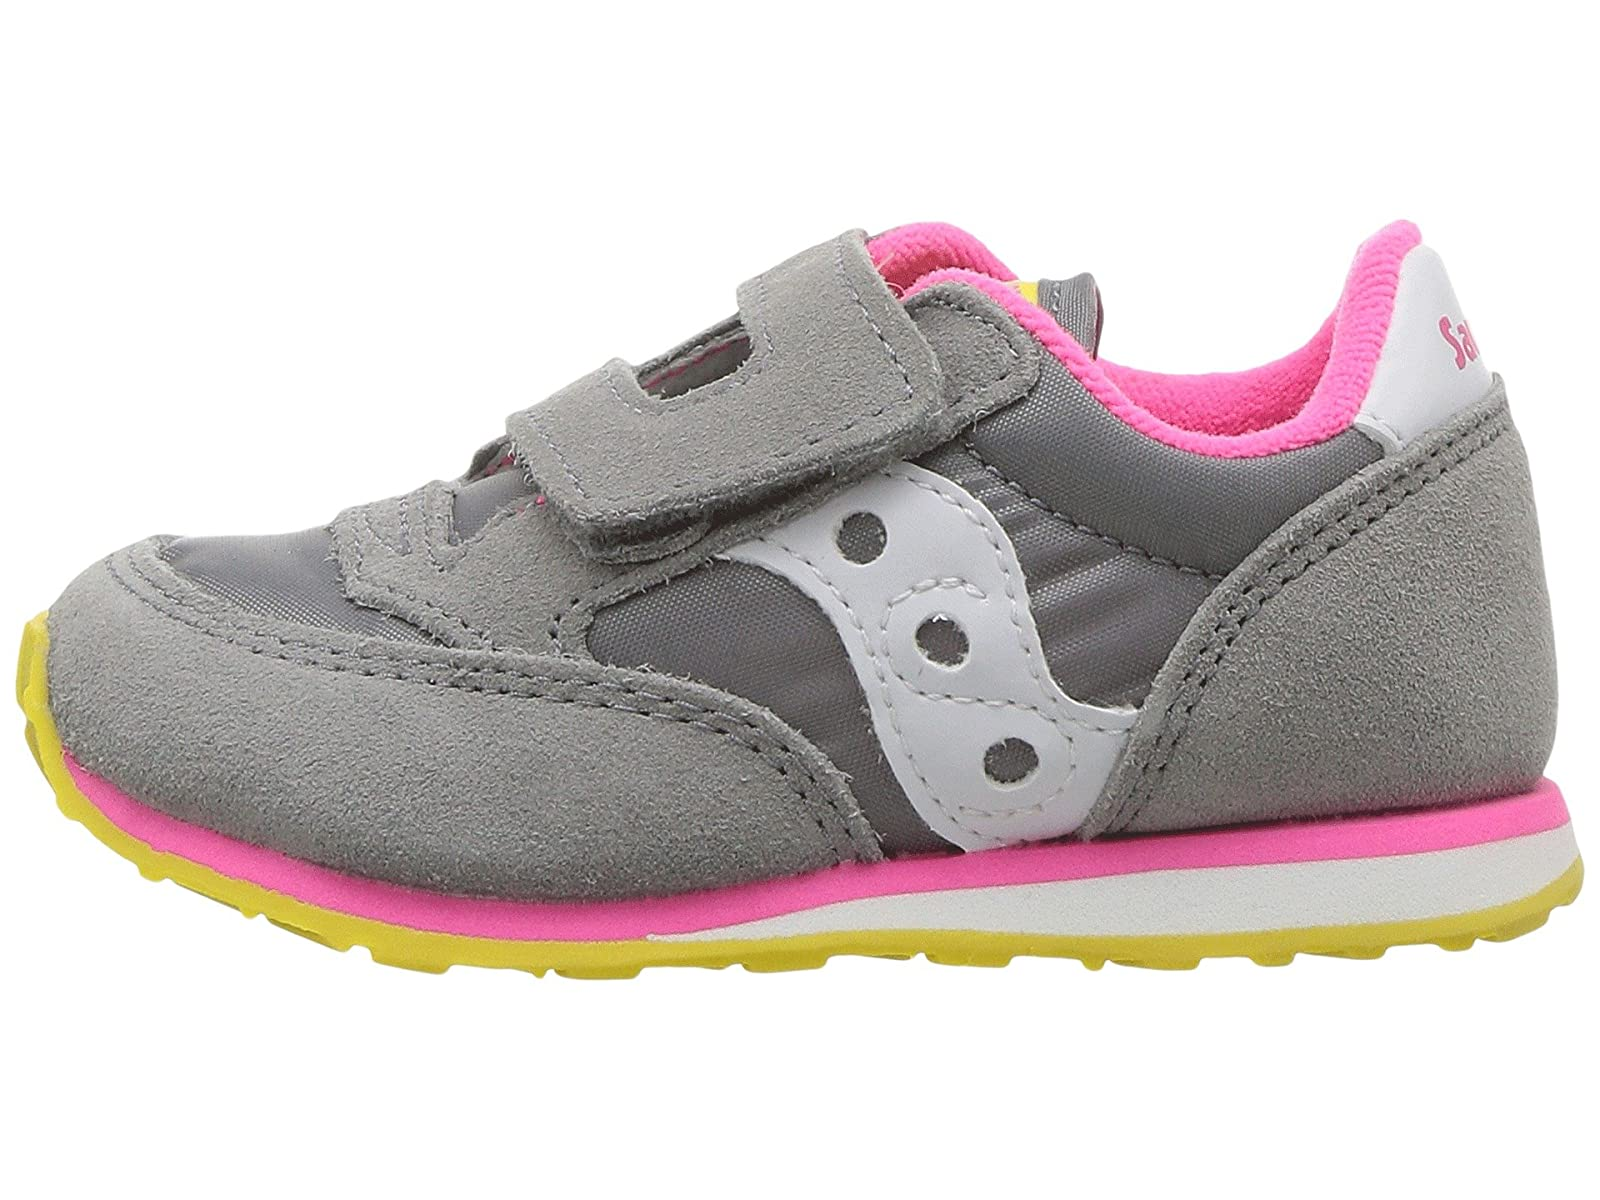 becbb26415 Details about Girl's Shoes Saucony Kids Originals Jazz Hook & Loop  (Toddler/Little Kid)